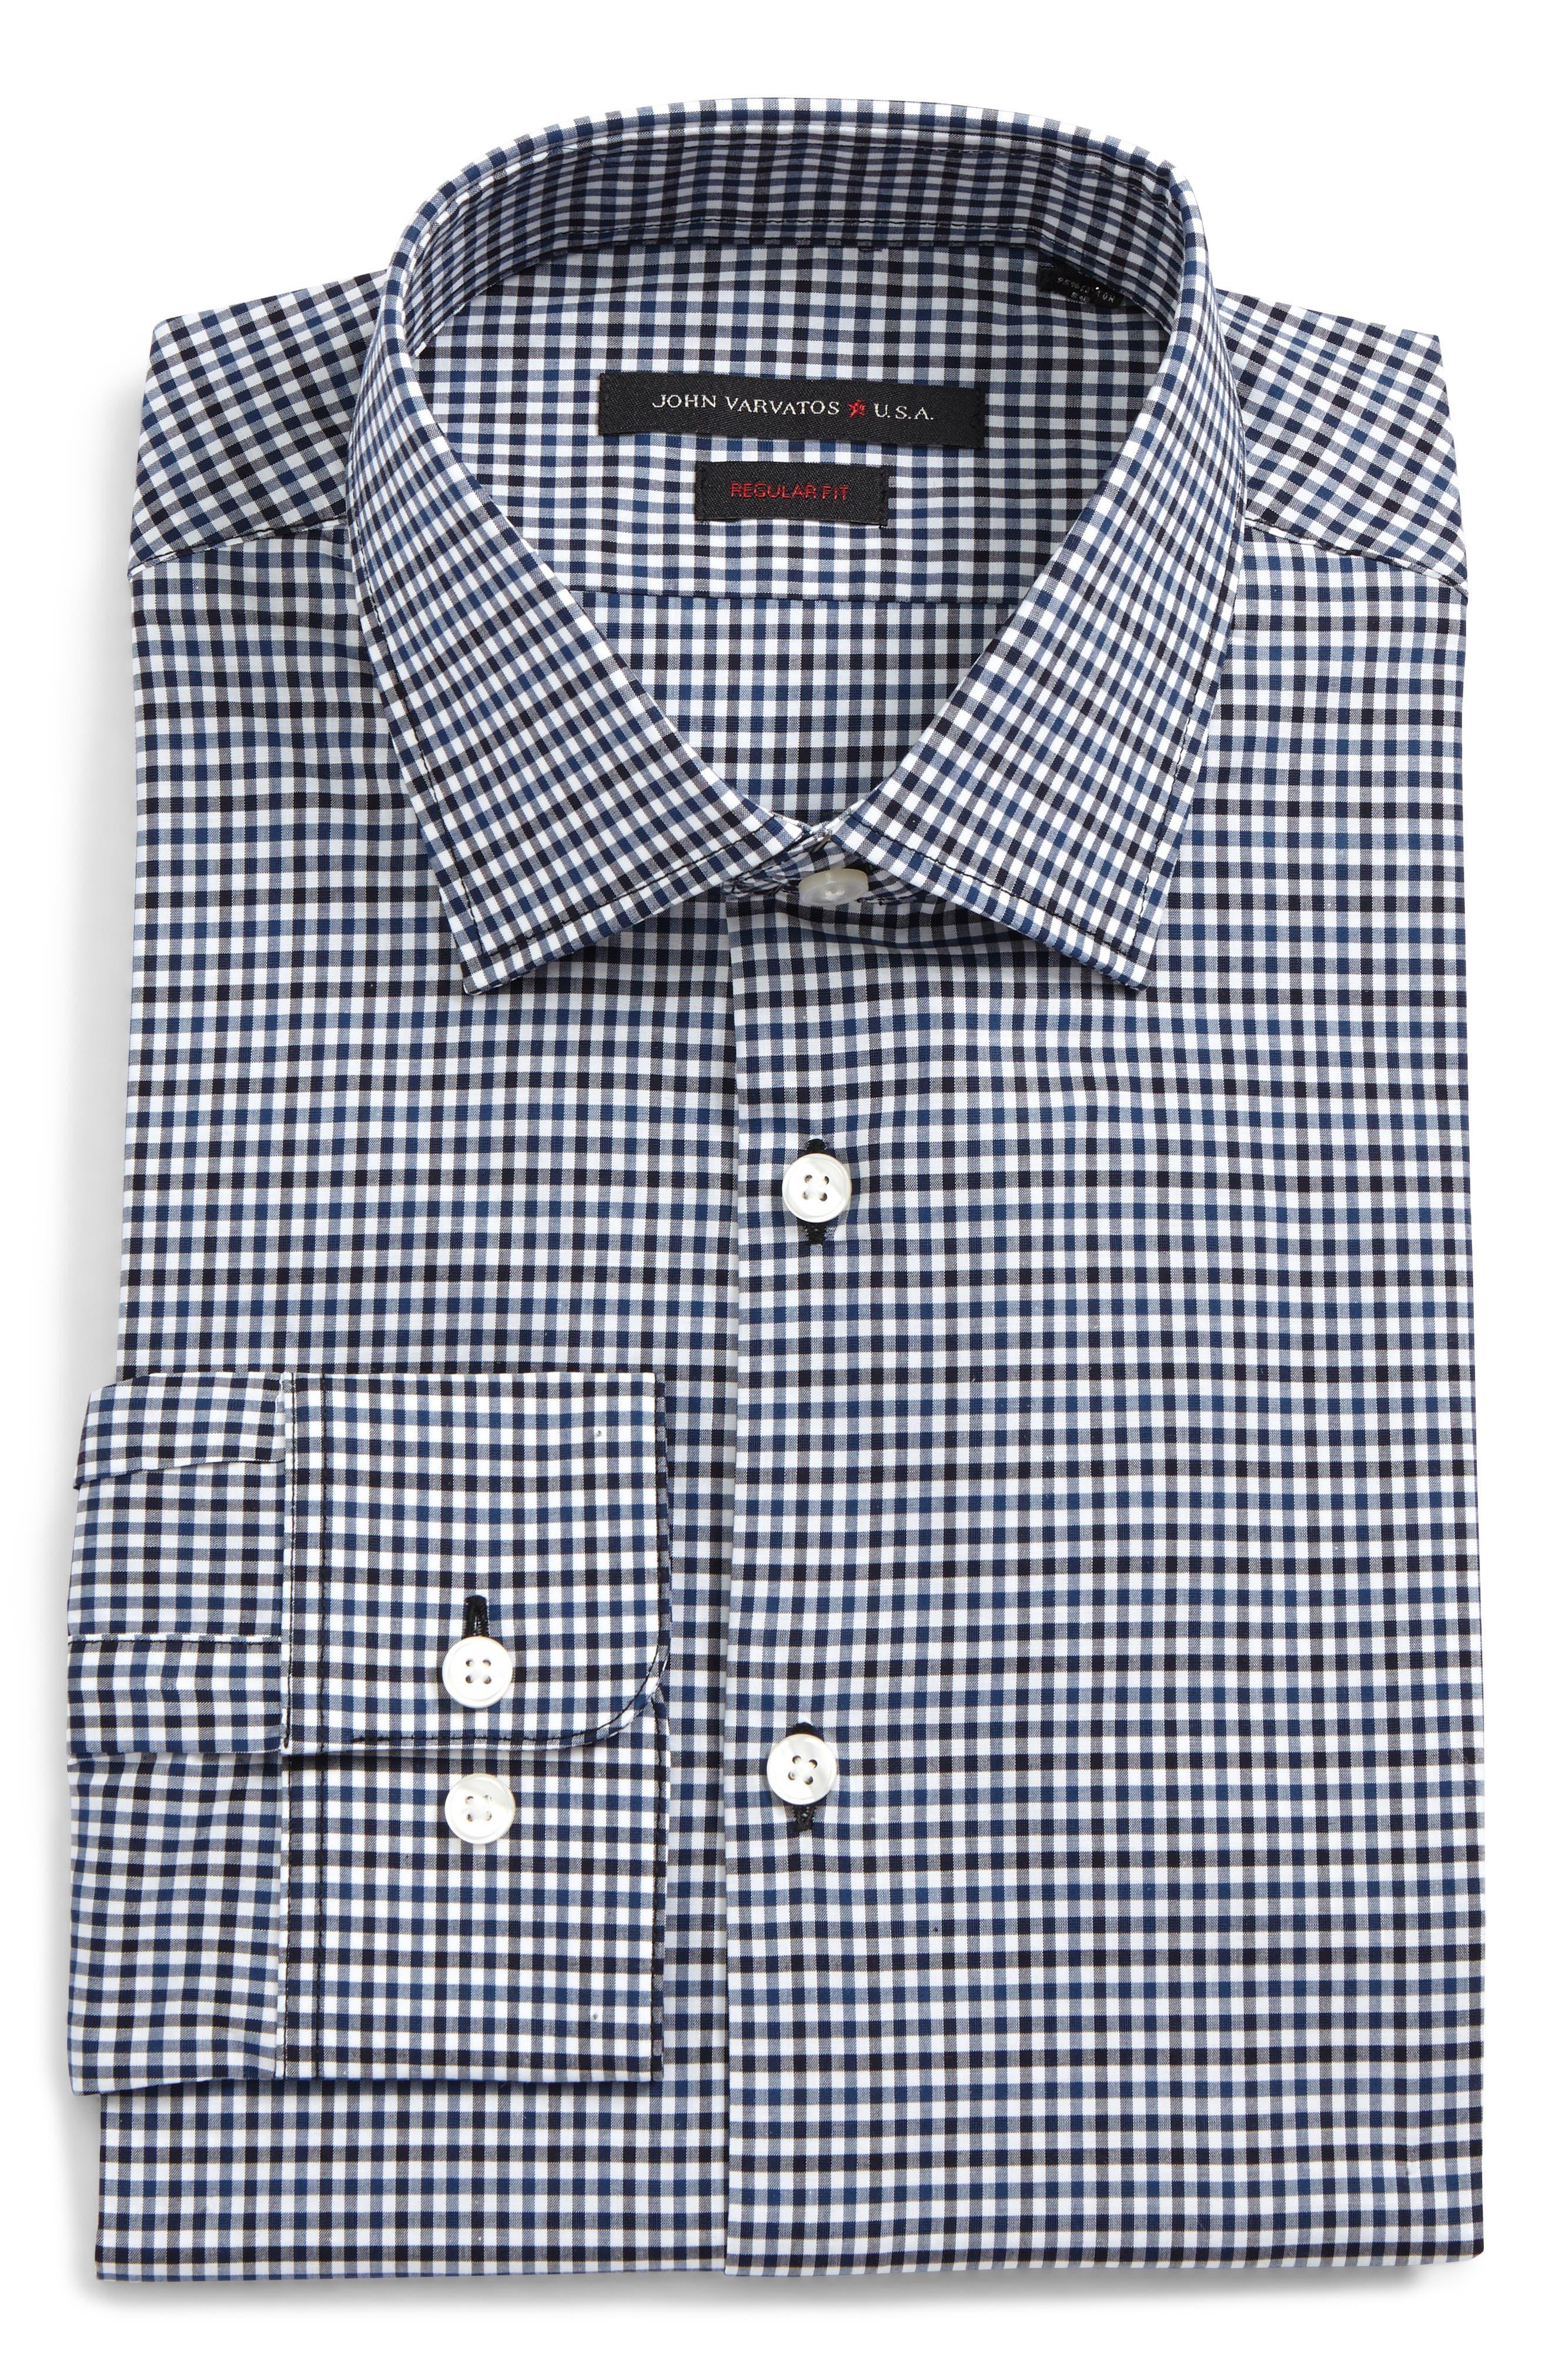 Regular Fit Stretch Check Dress Shirt,                             Main thumbnail 1, color,                             Navy